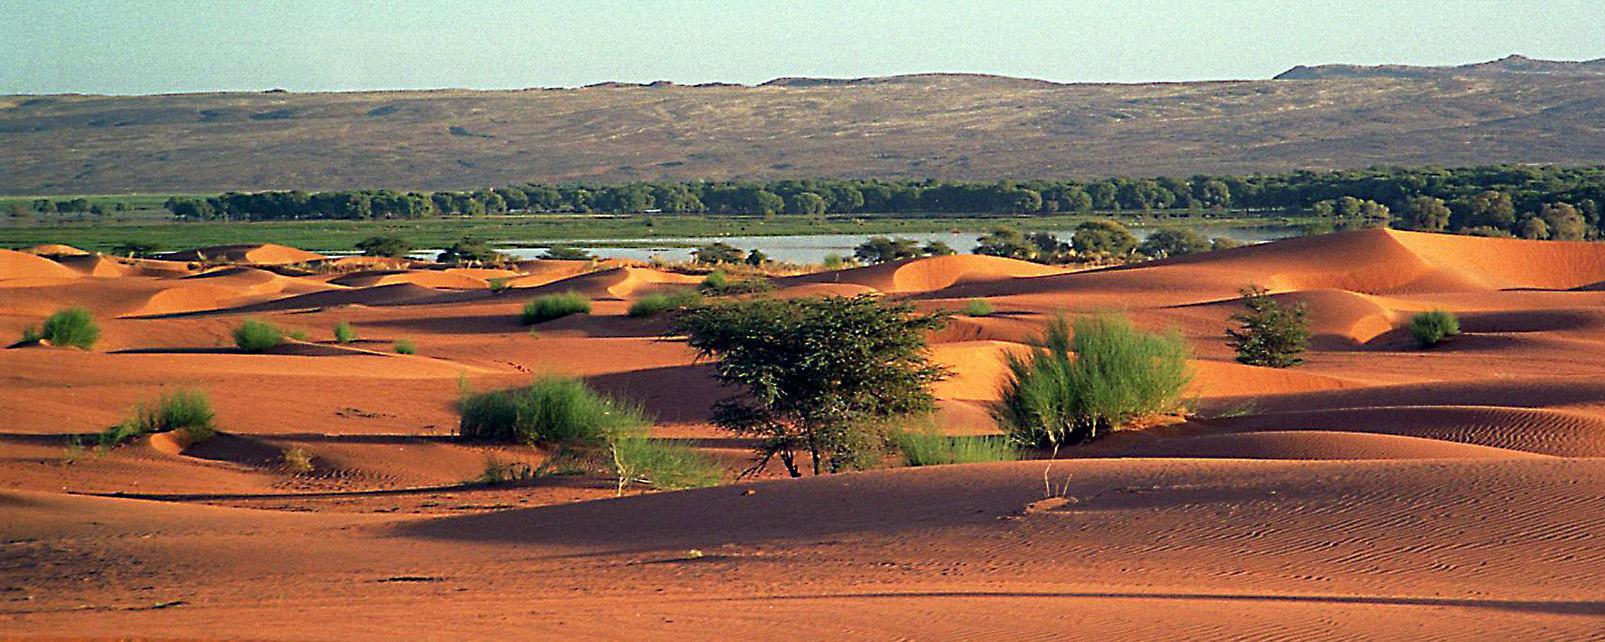 La Mauritanie - Christine Daure-Serfaty